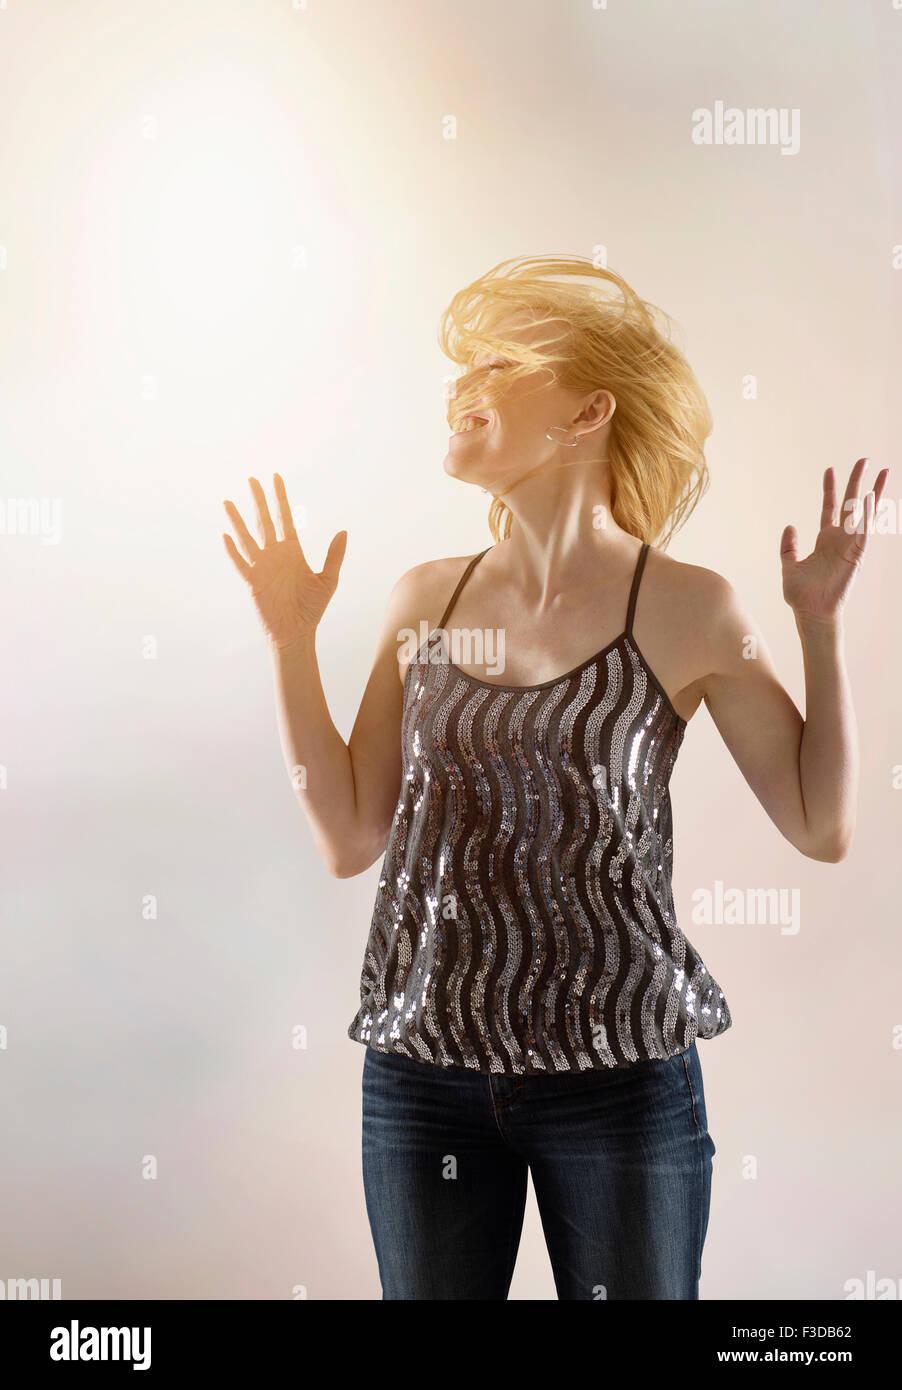 Happy woman dancing in studio - Stock Image